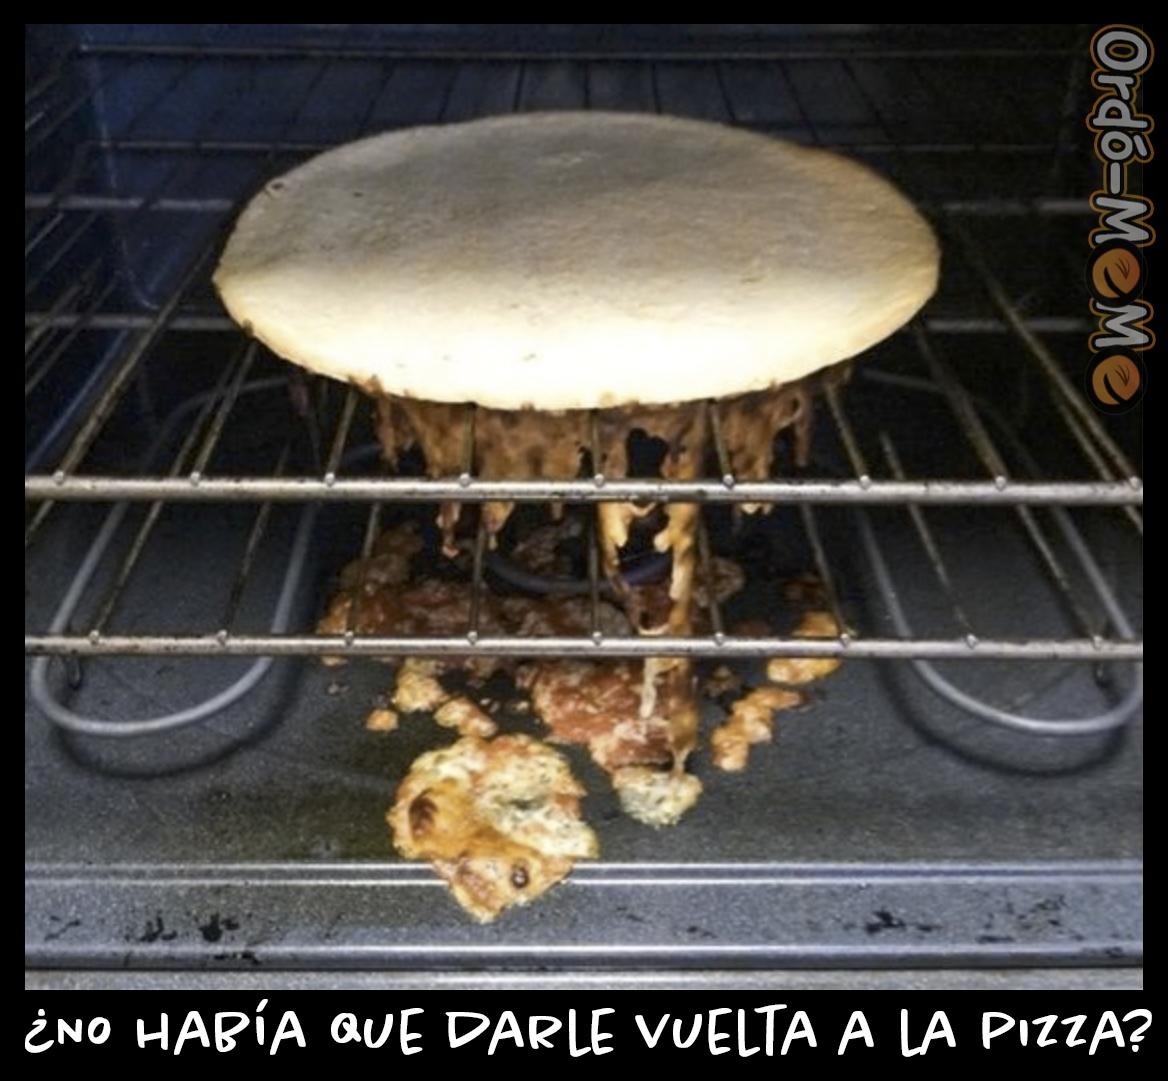 Meme vuelta a la pizza